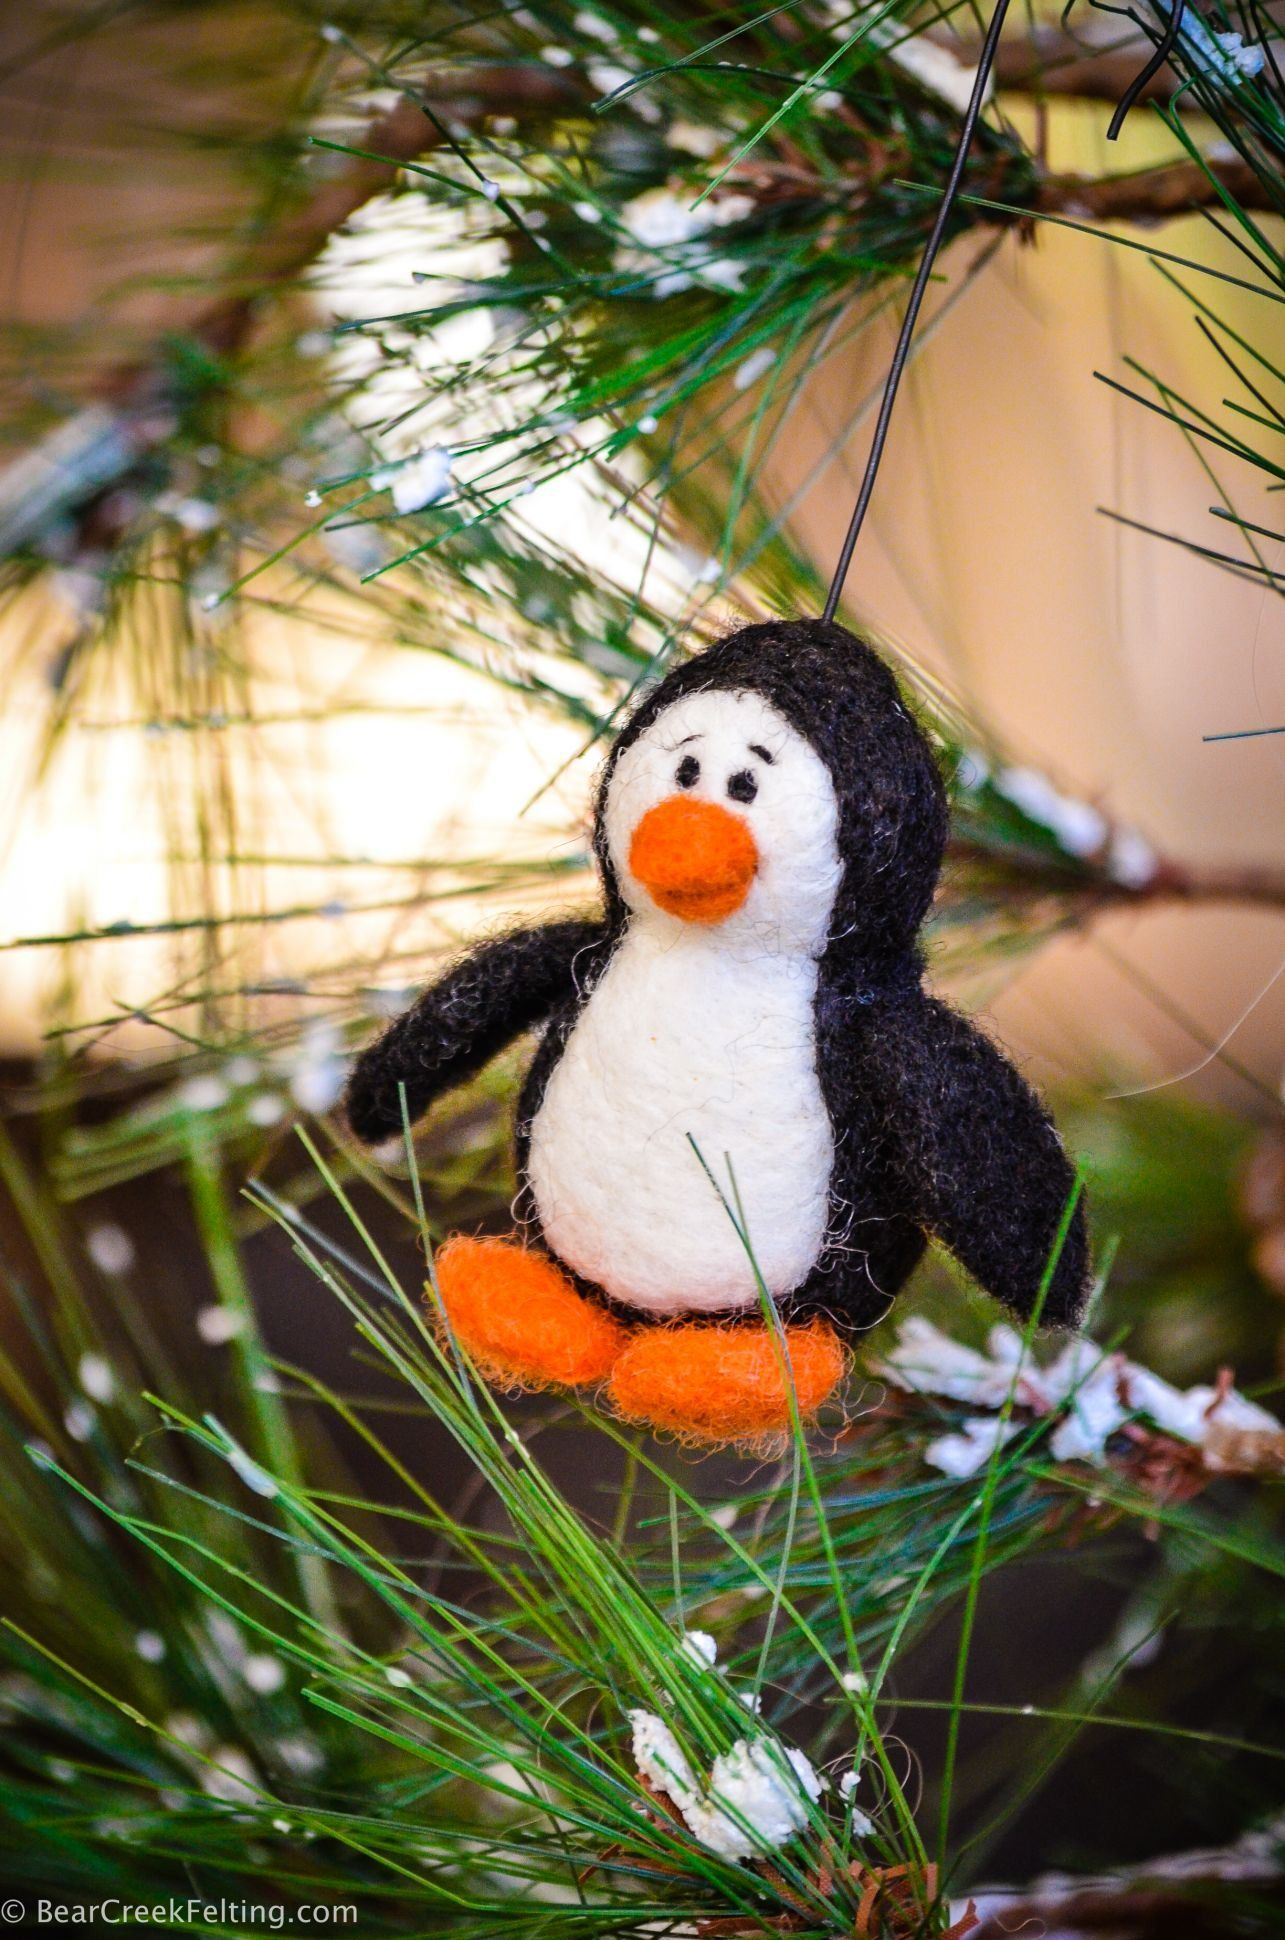 DIY Felt Christmas Ornaments - Bear Creek Felting